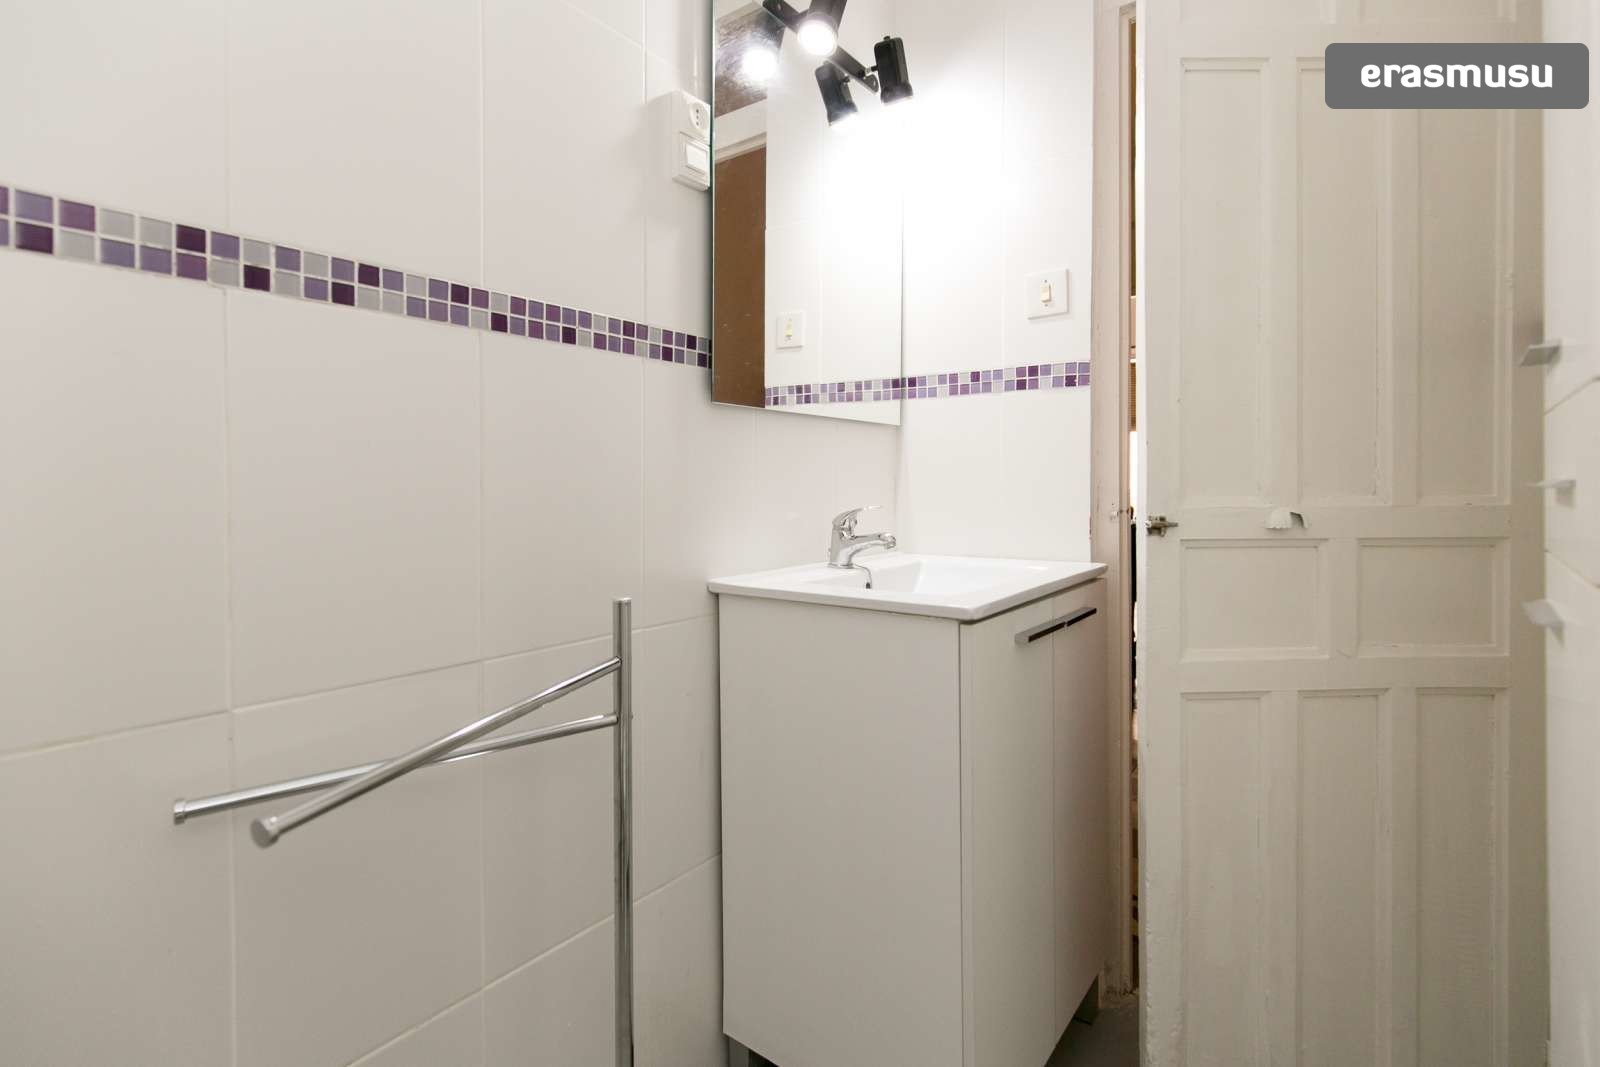 spacious-3-bedroom-apartment-rent-realejo-7004af1aea2e6a6e790e3e